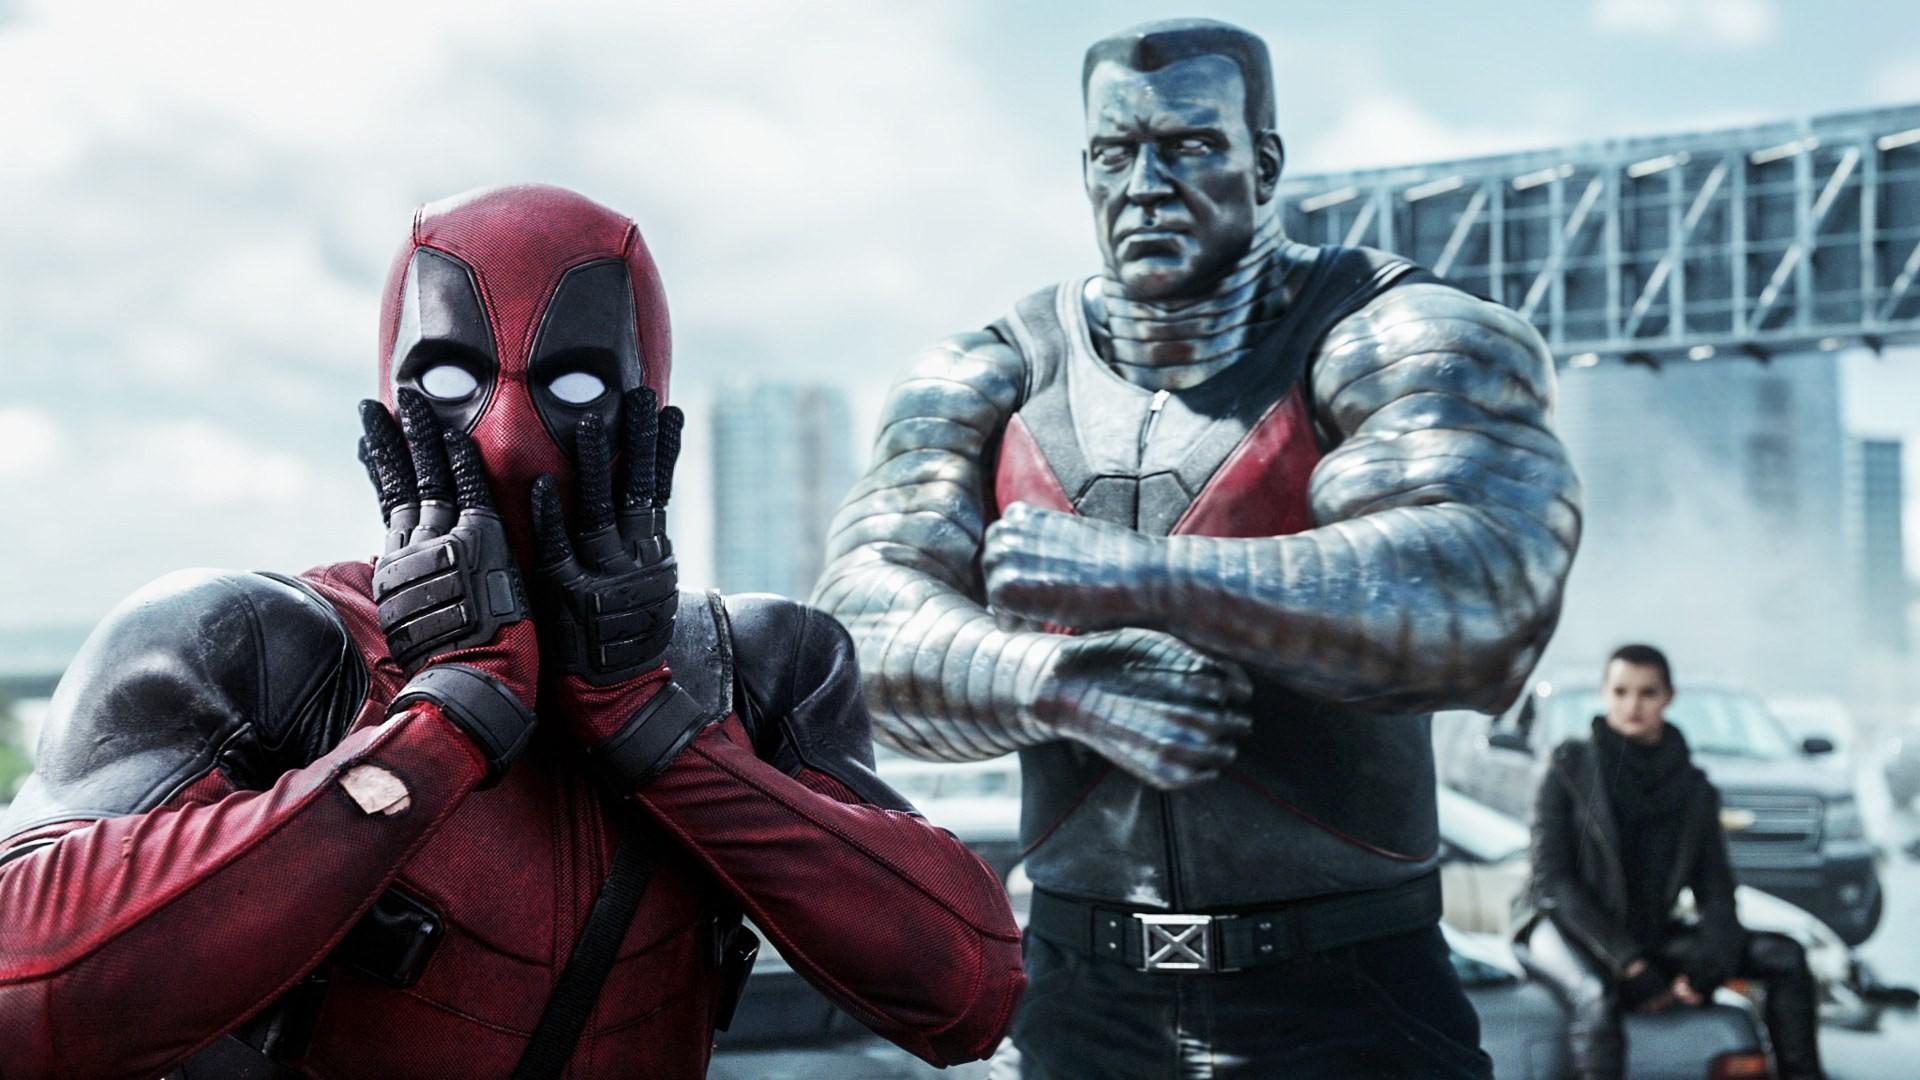 Deadpool trifft auf die Avengers